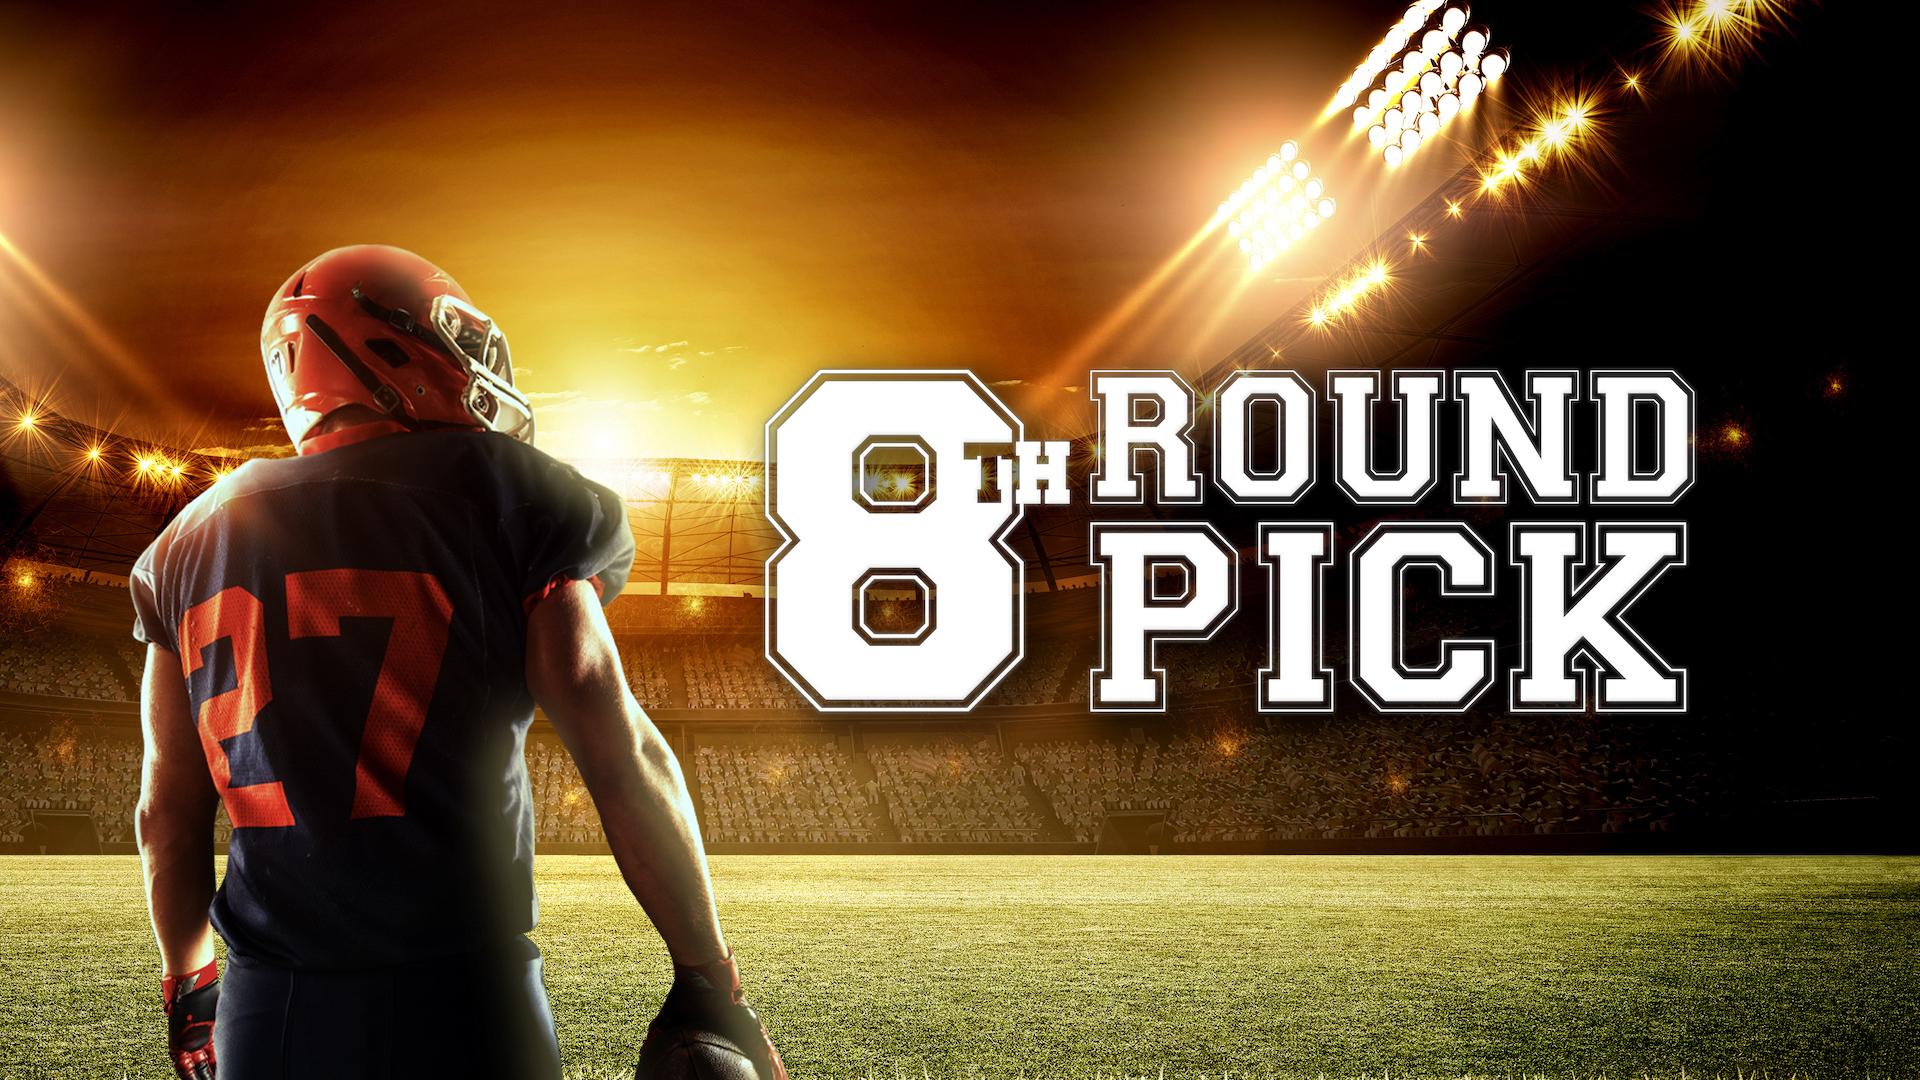 8th Round Pick